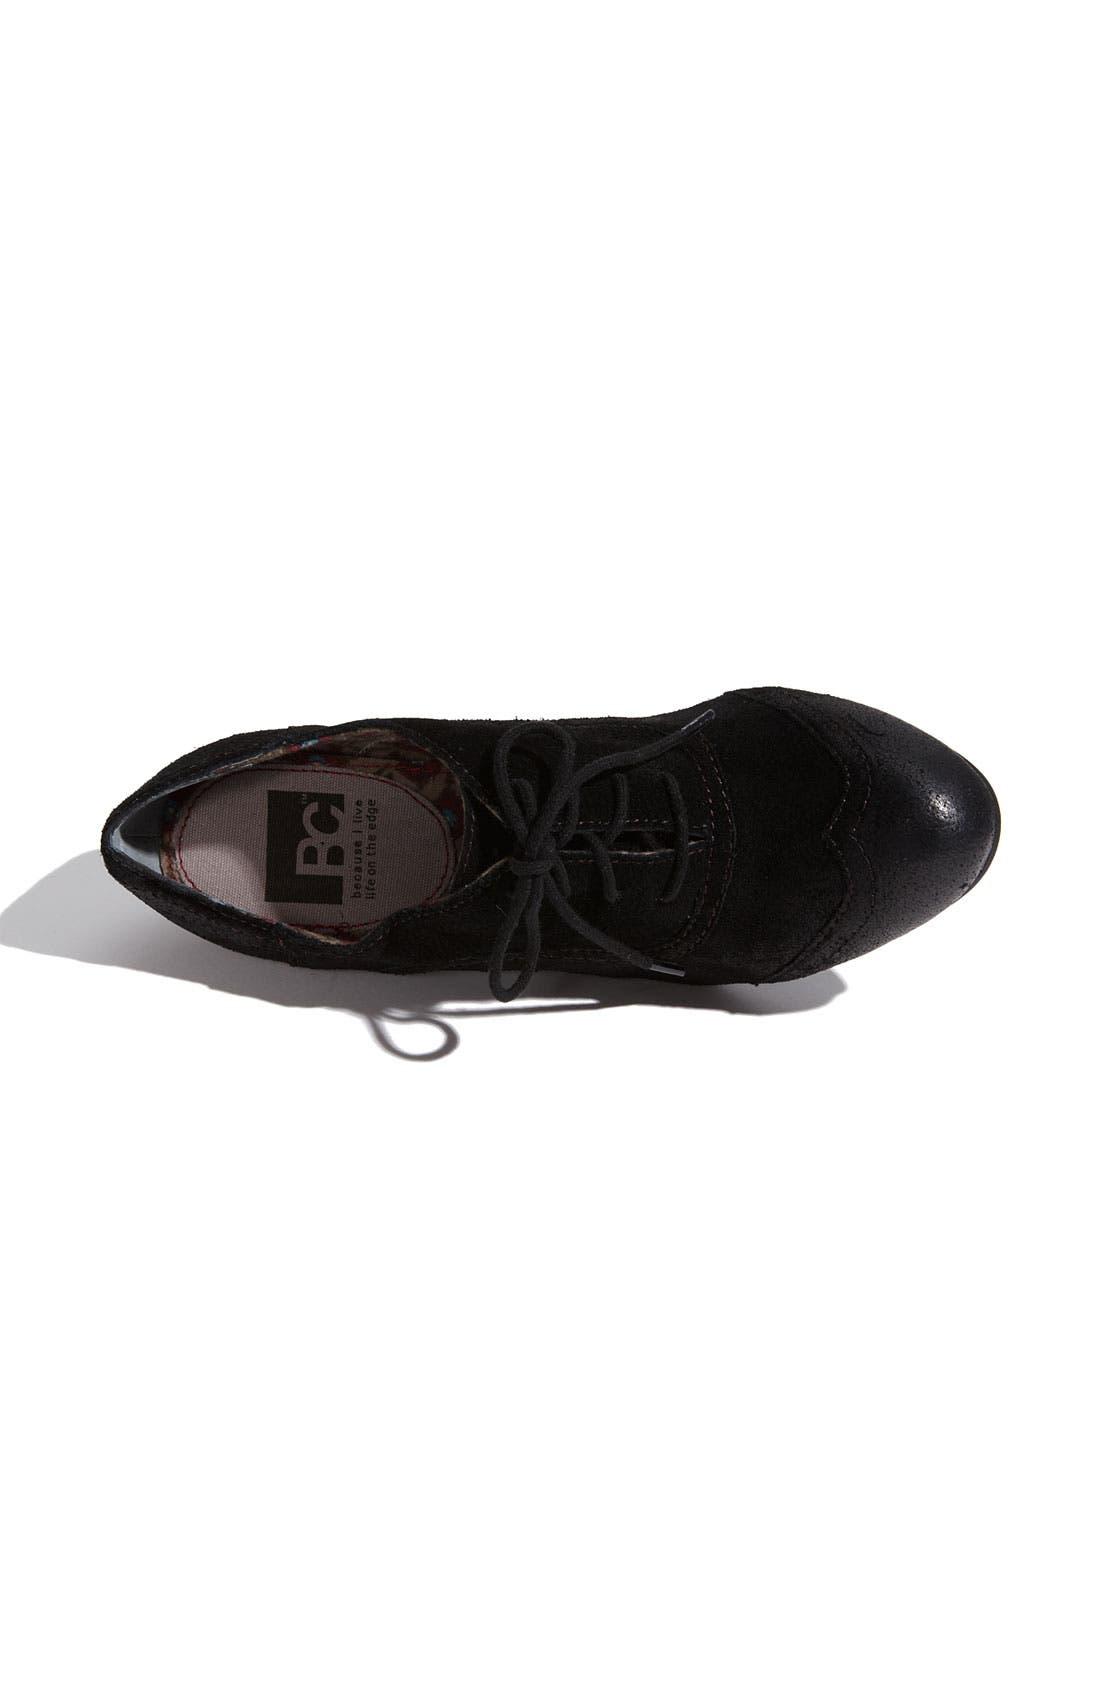 Alternate Image 3  - BC Footwear 'Foil' Oxford Pump